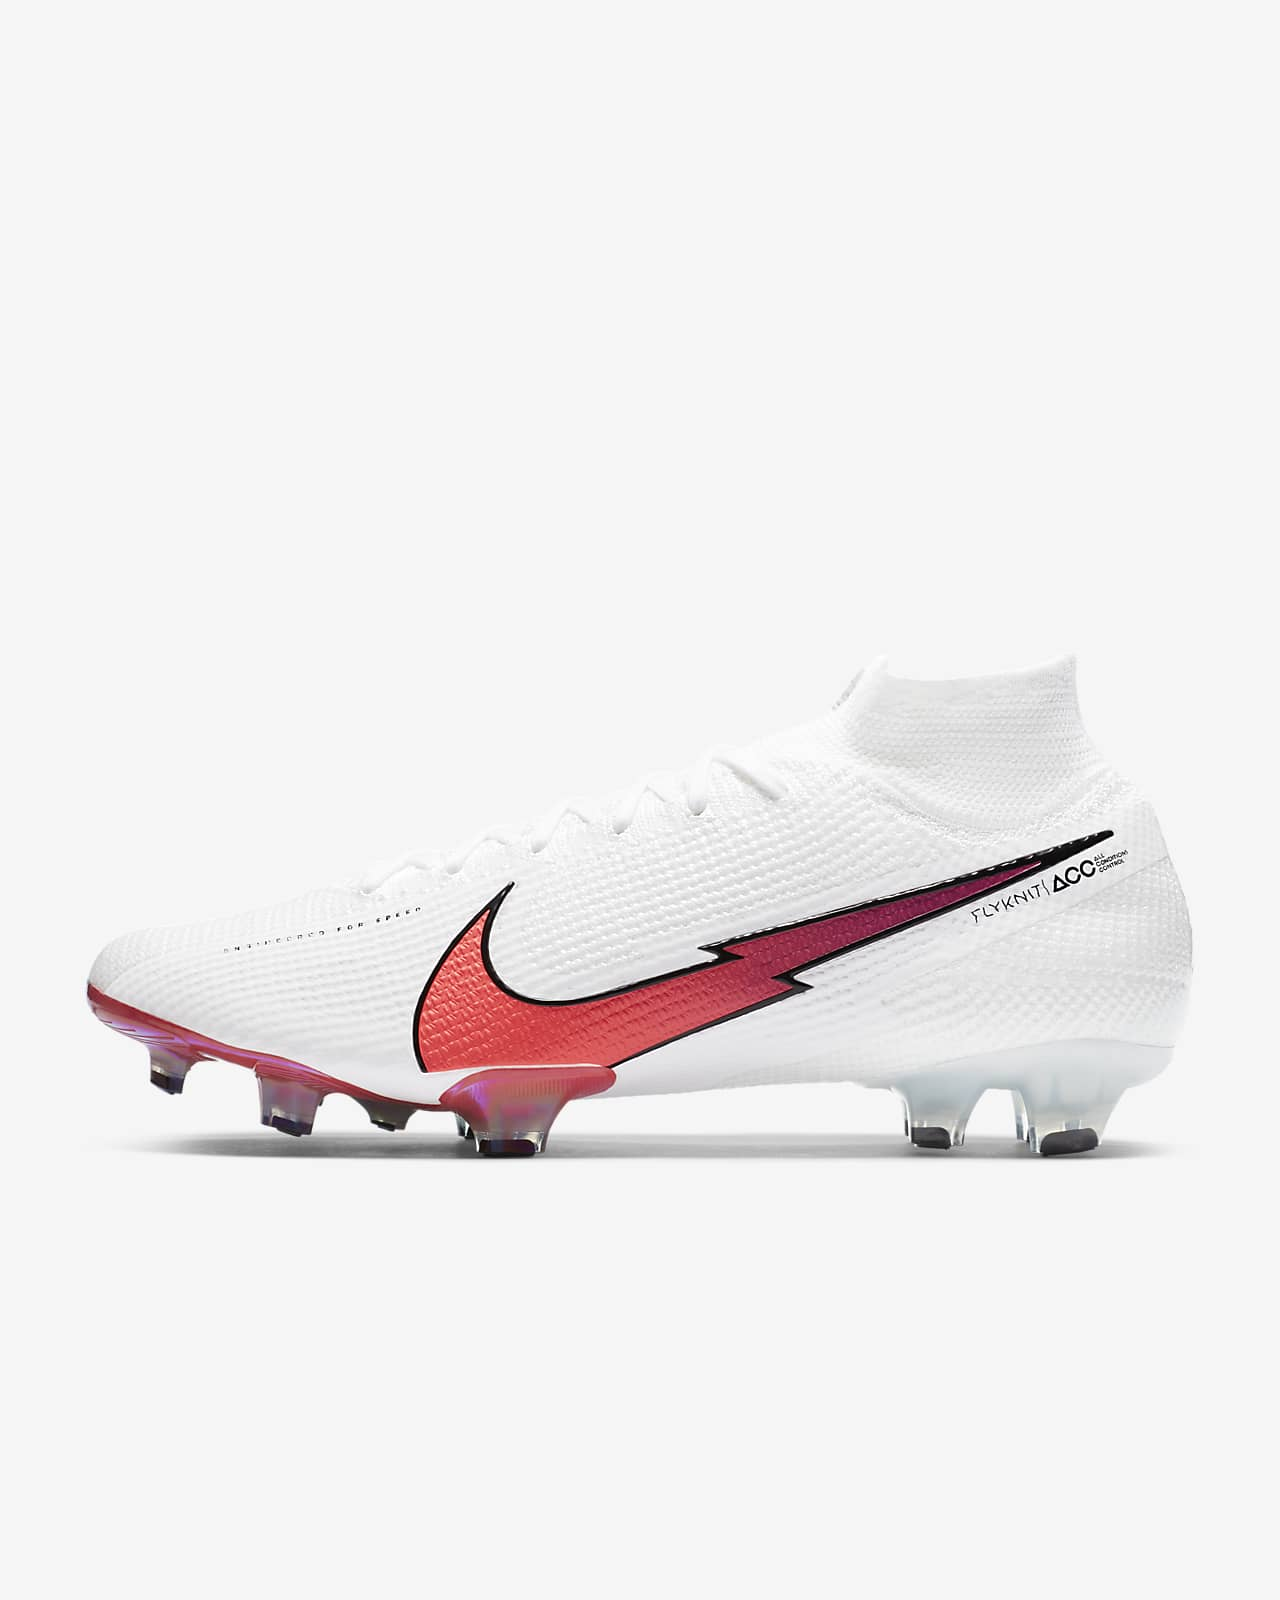 Scarpa da calcio per terreni duri Nike Mercurial Superfly 7 Elite FG